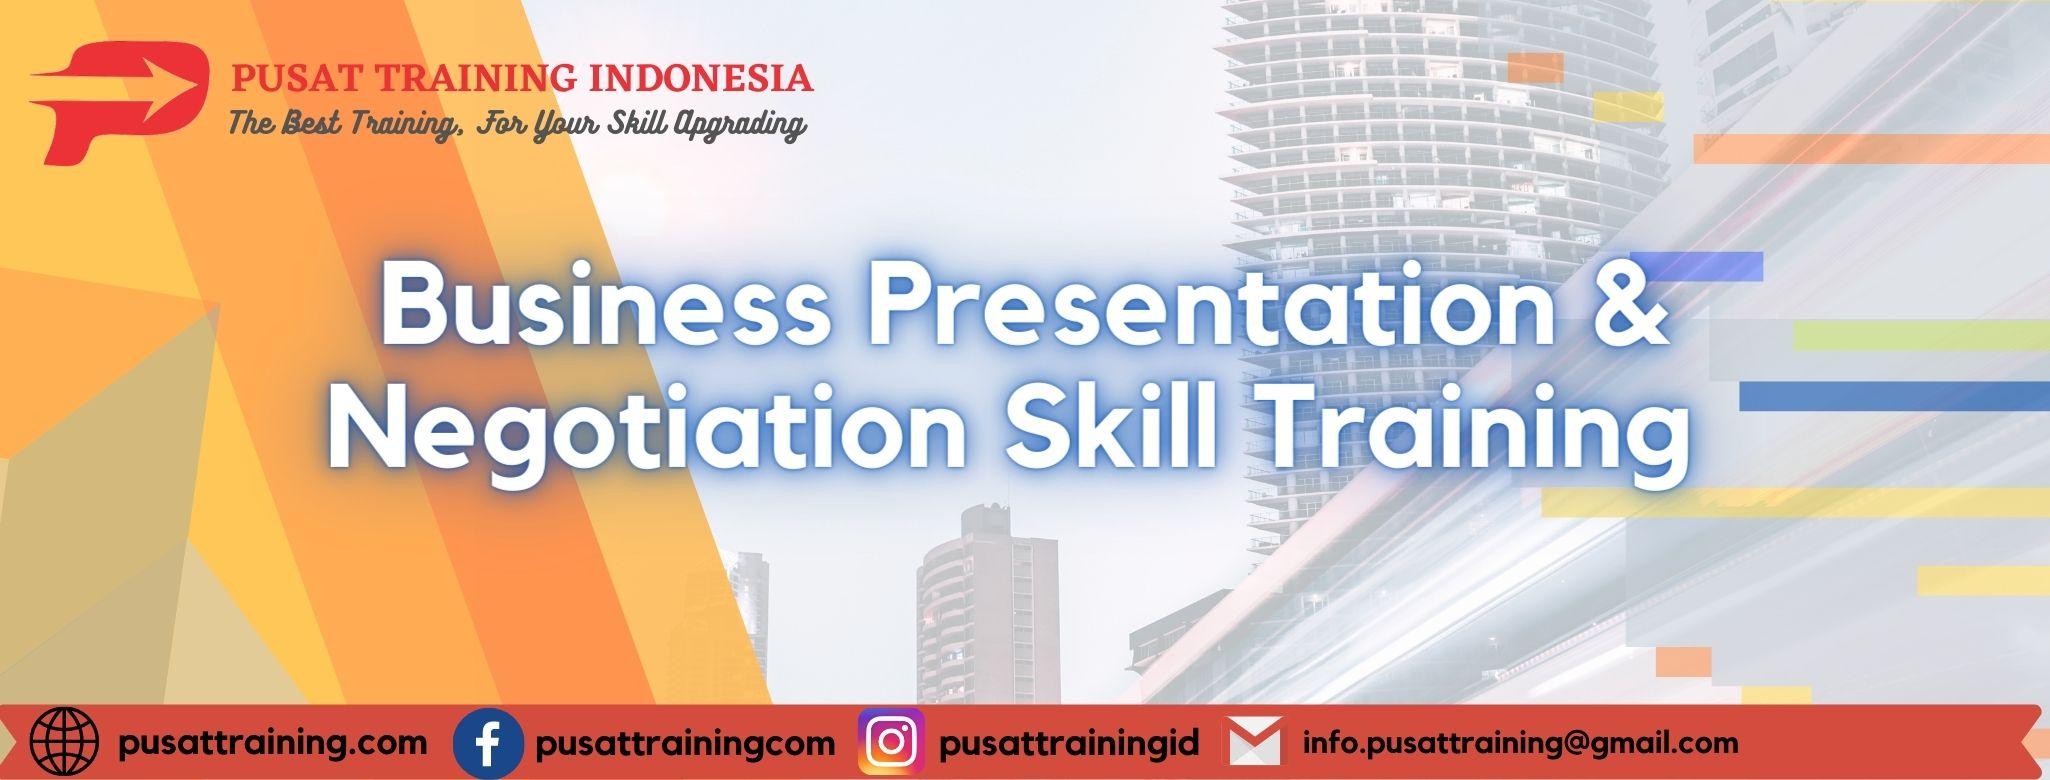 Business-Presentation-Negotiation-Skill-Training